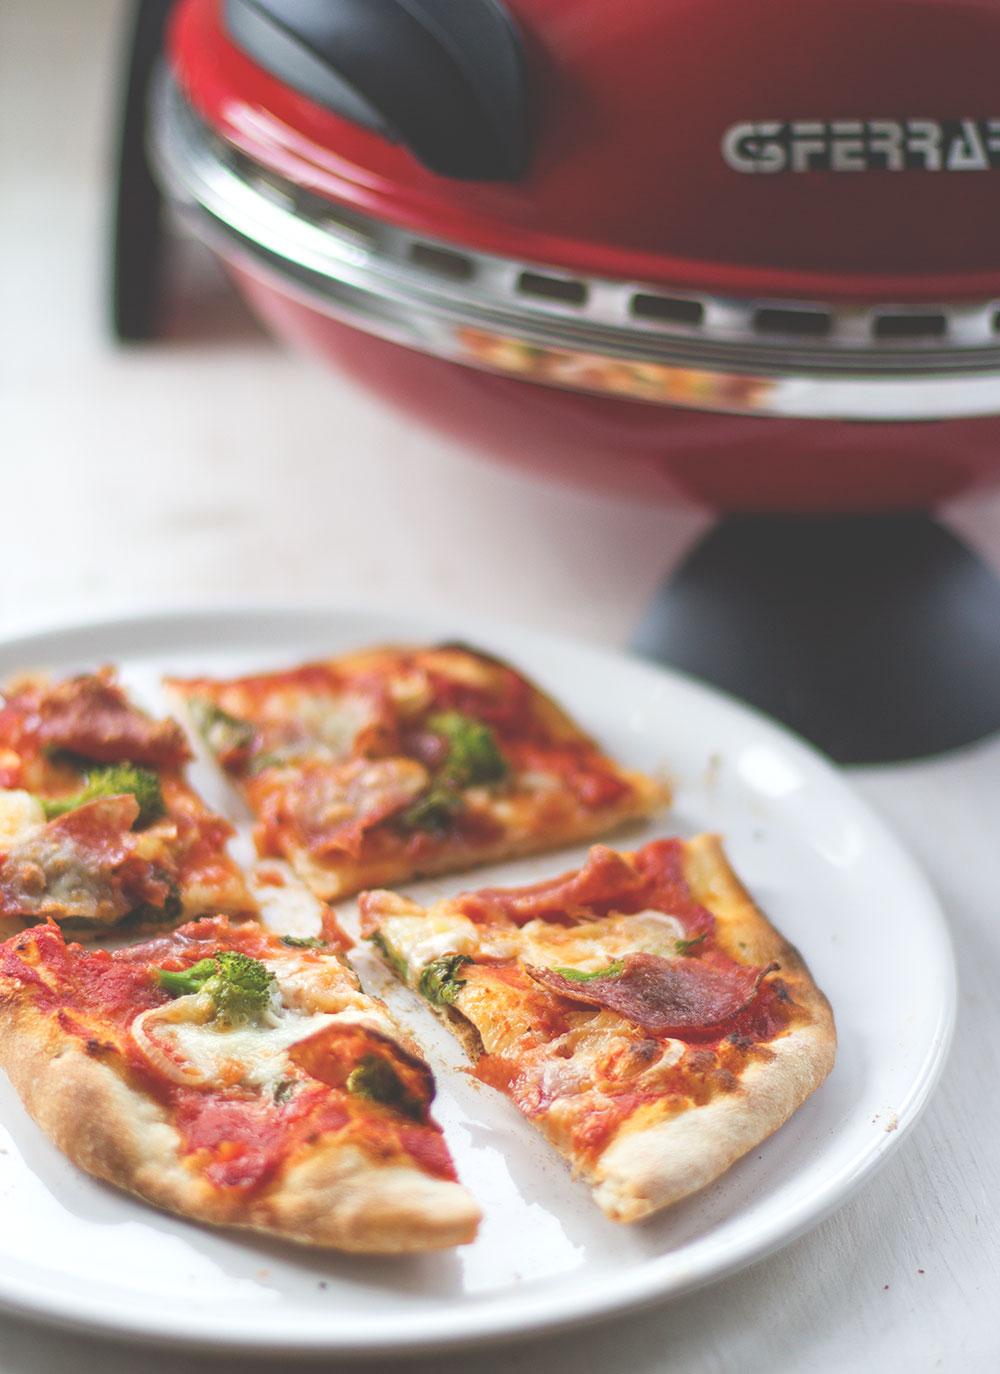 Homemade Pizza mit dem Pizzaofen GFerrari - Pizzabäcker ohne Backofen